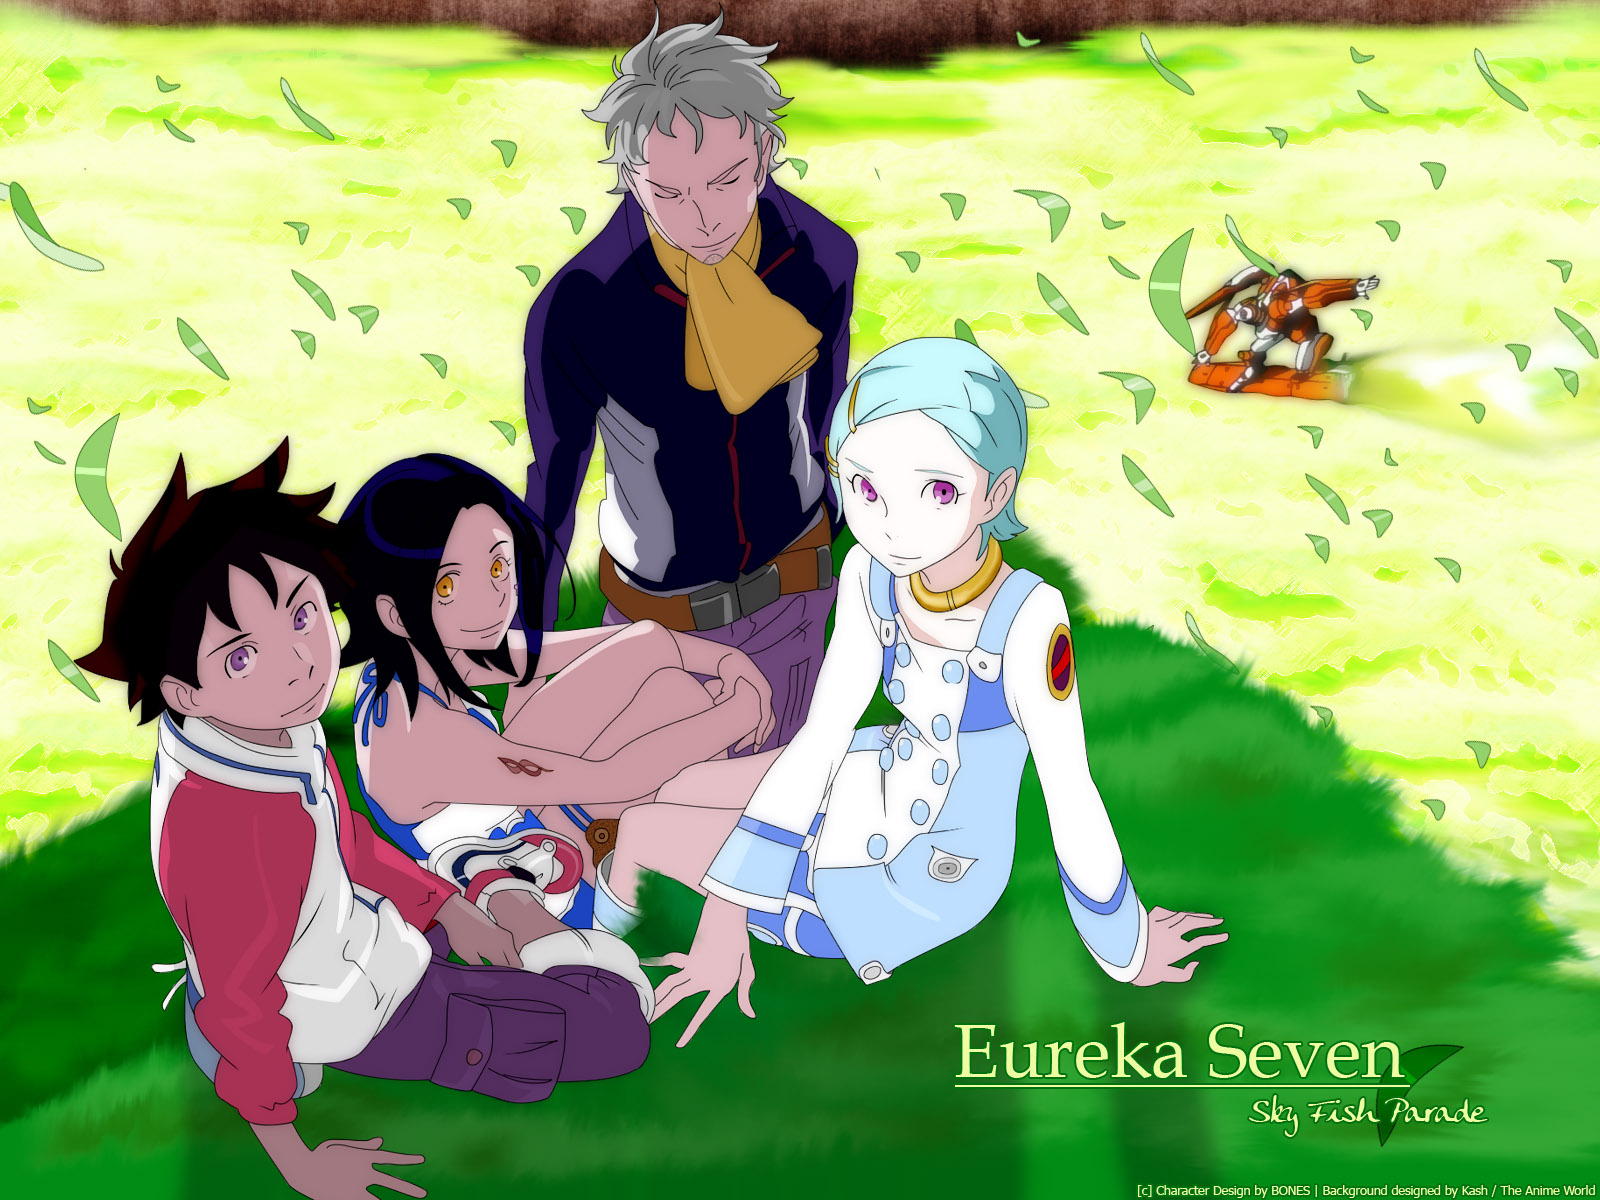 eureka eureka_seven holland_novak renton_thurston talho_yuuki